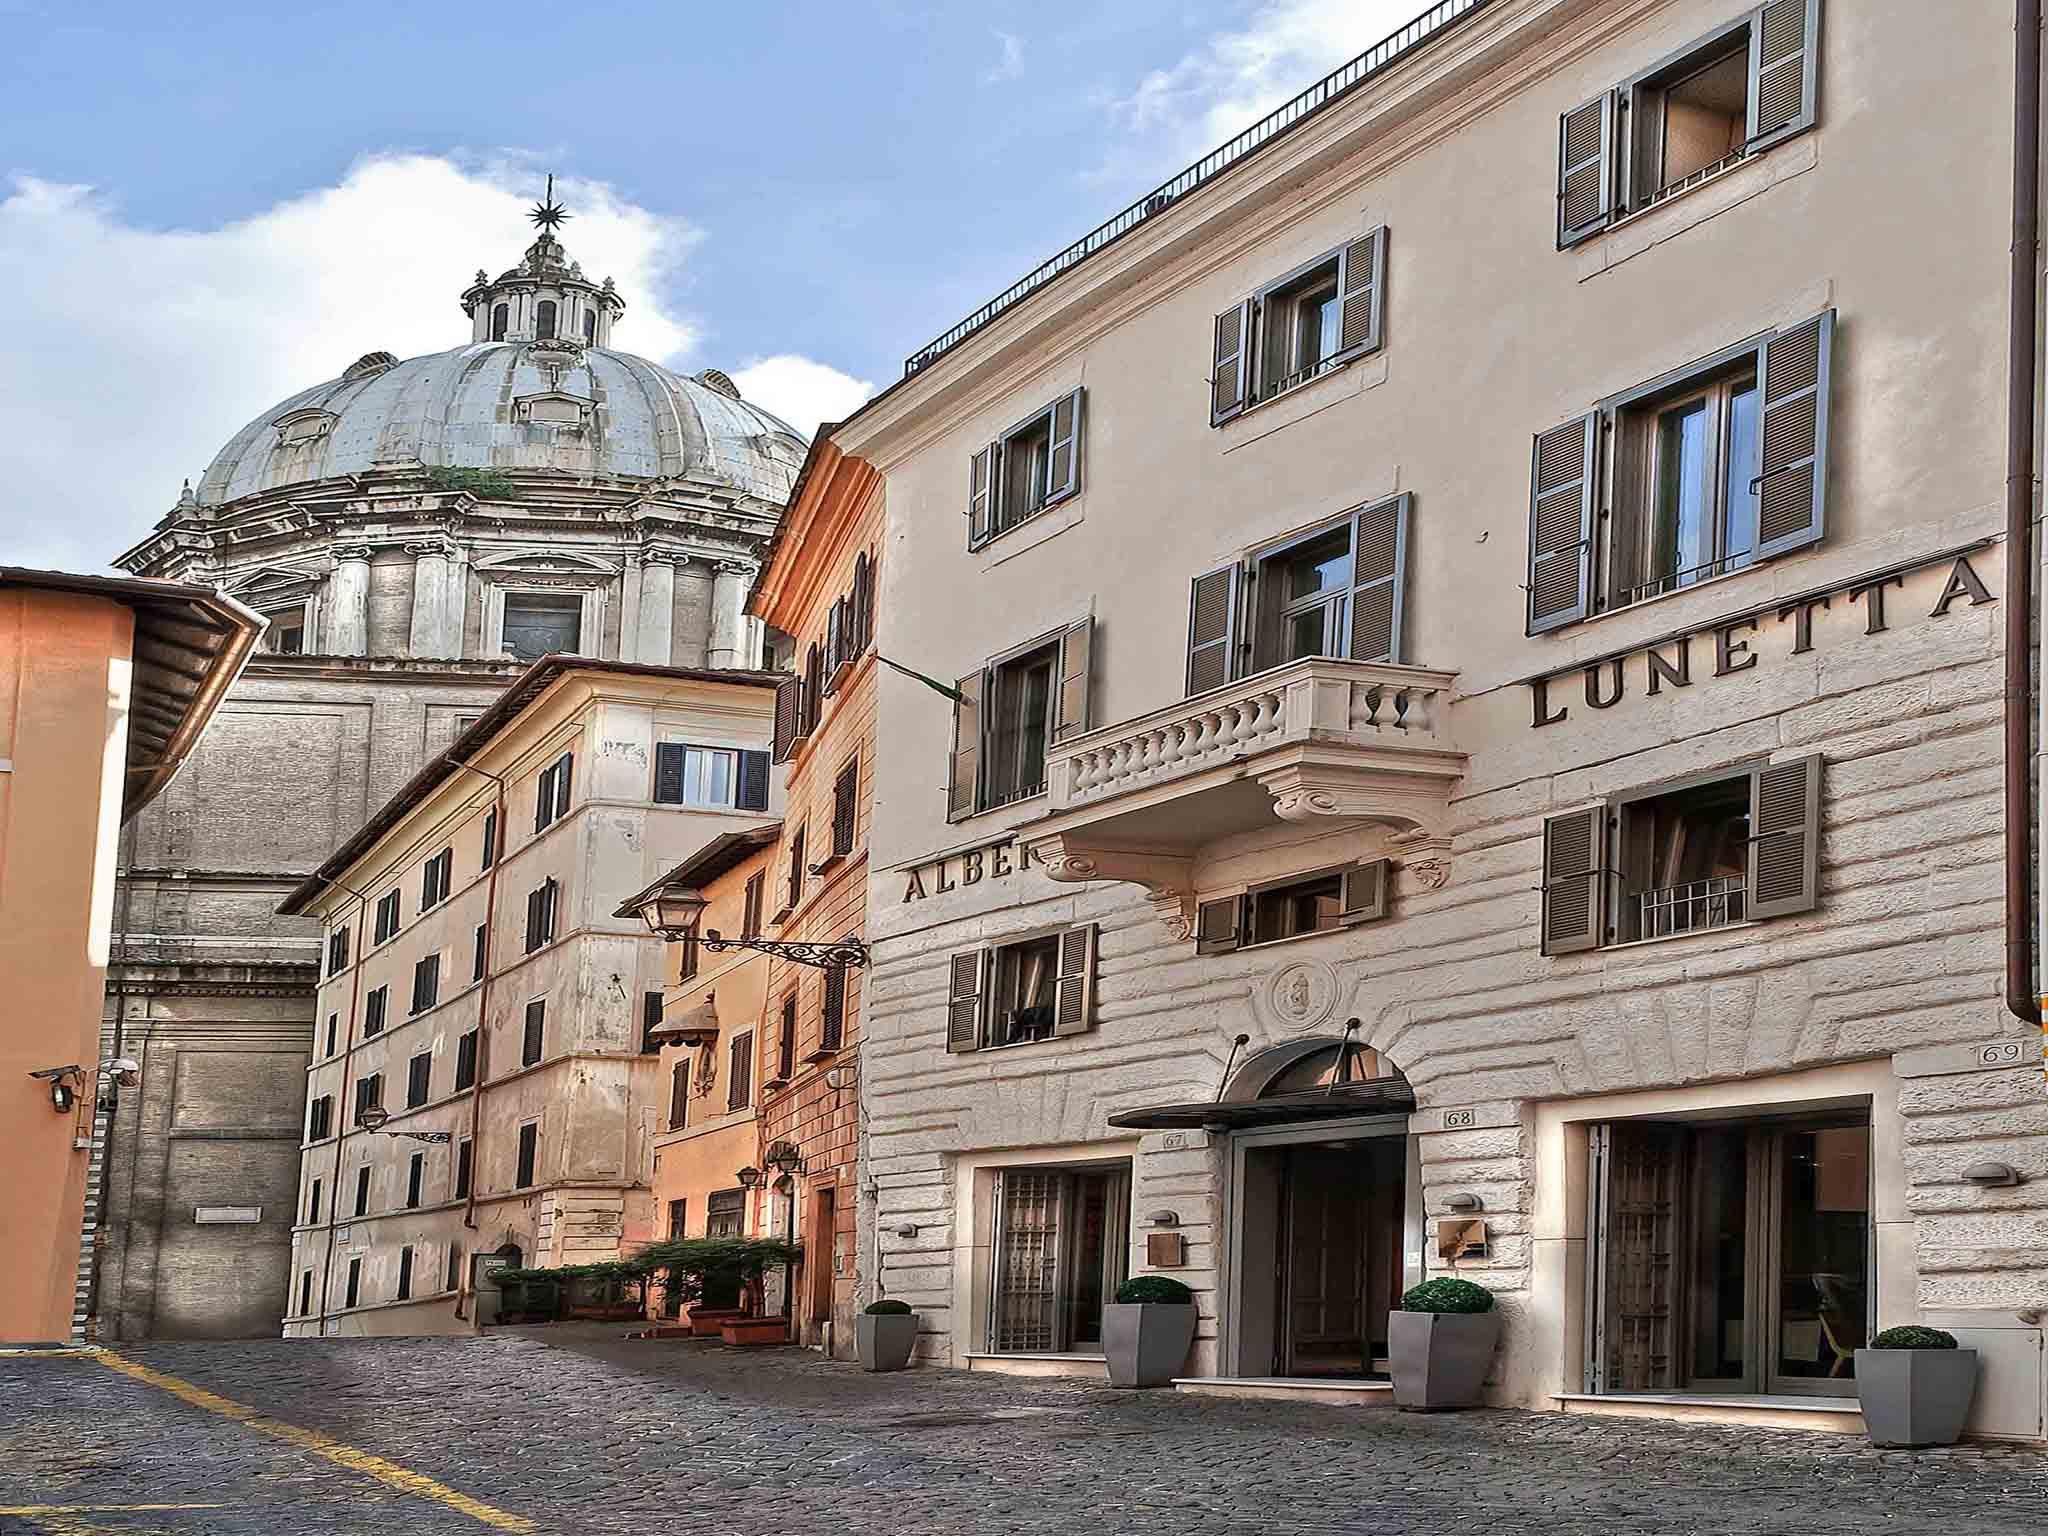 Lunetta Hotel Roma